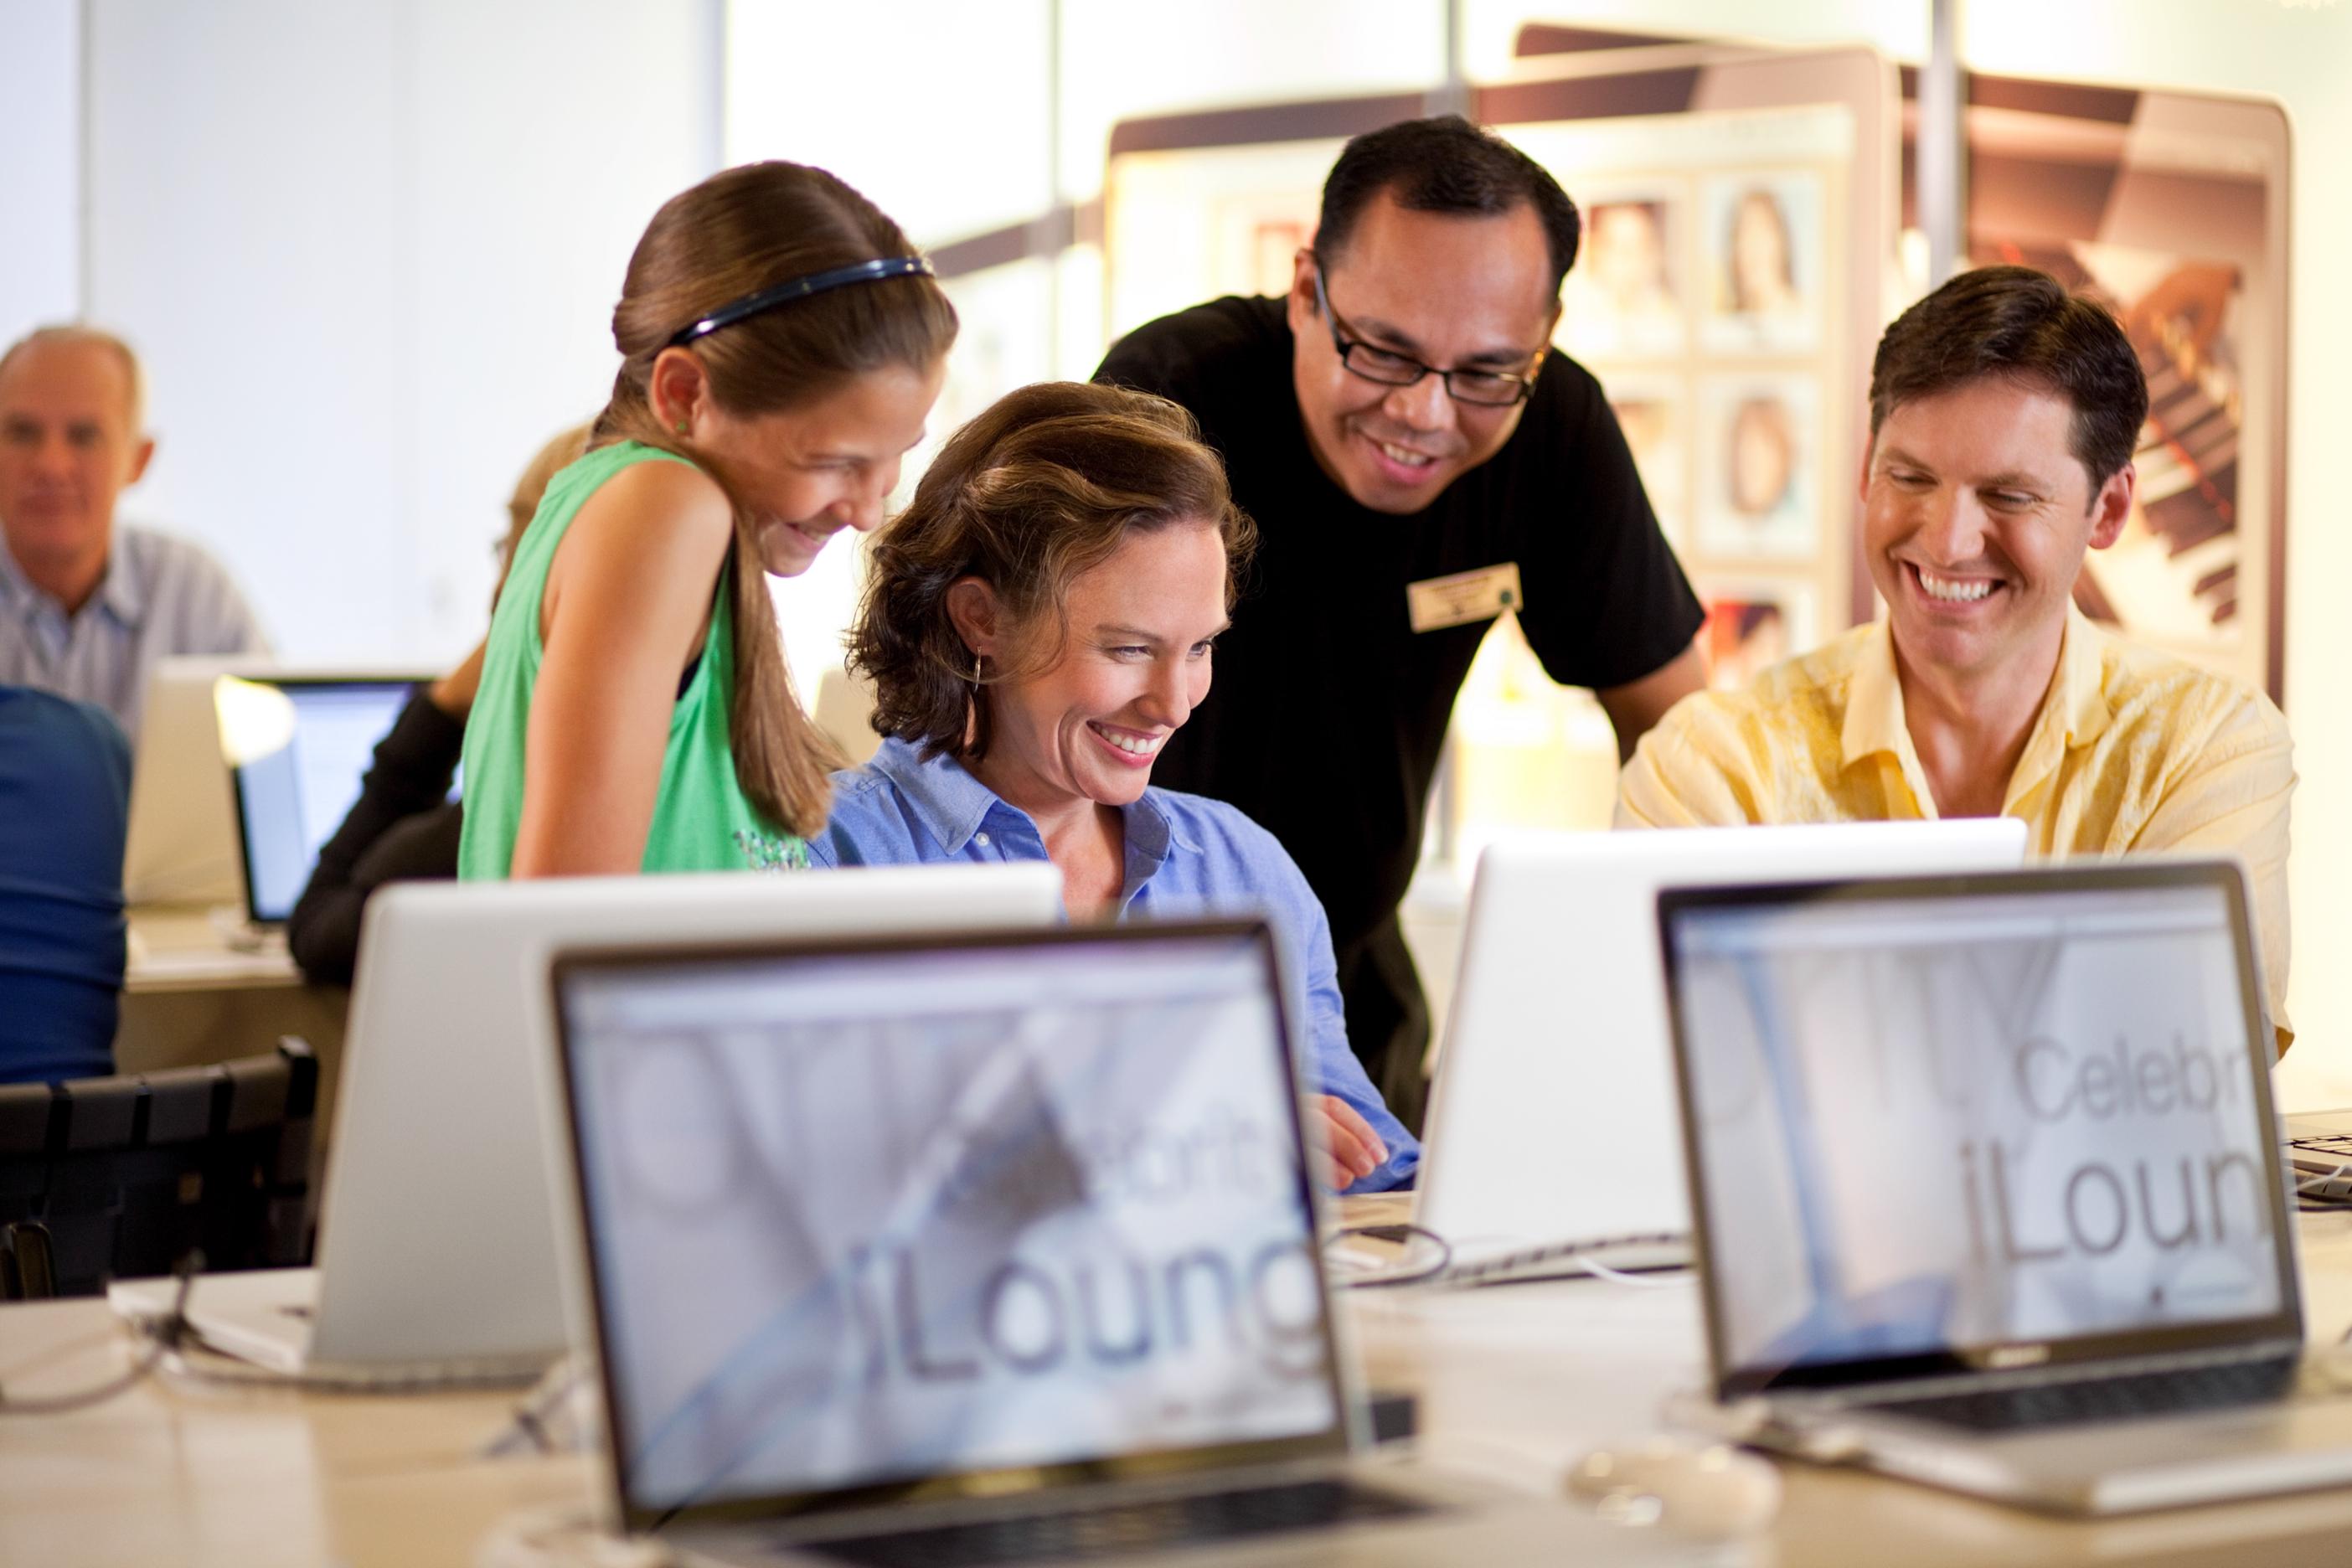 Internet Cafe iLounge